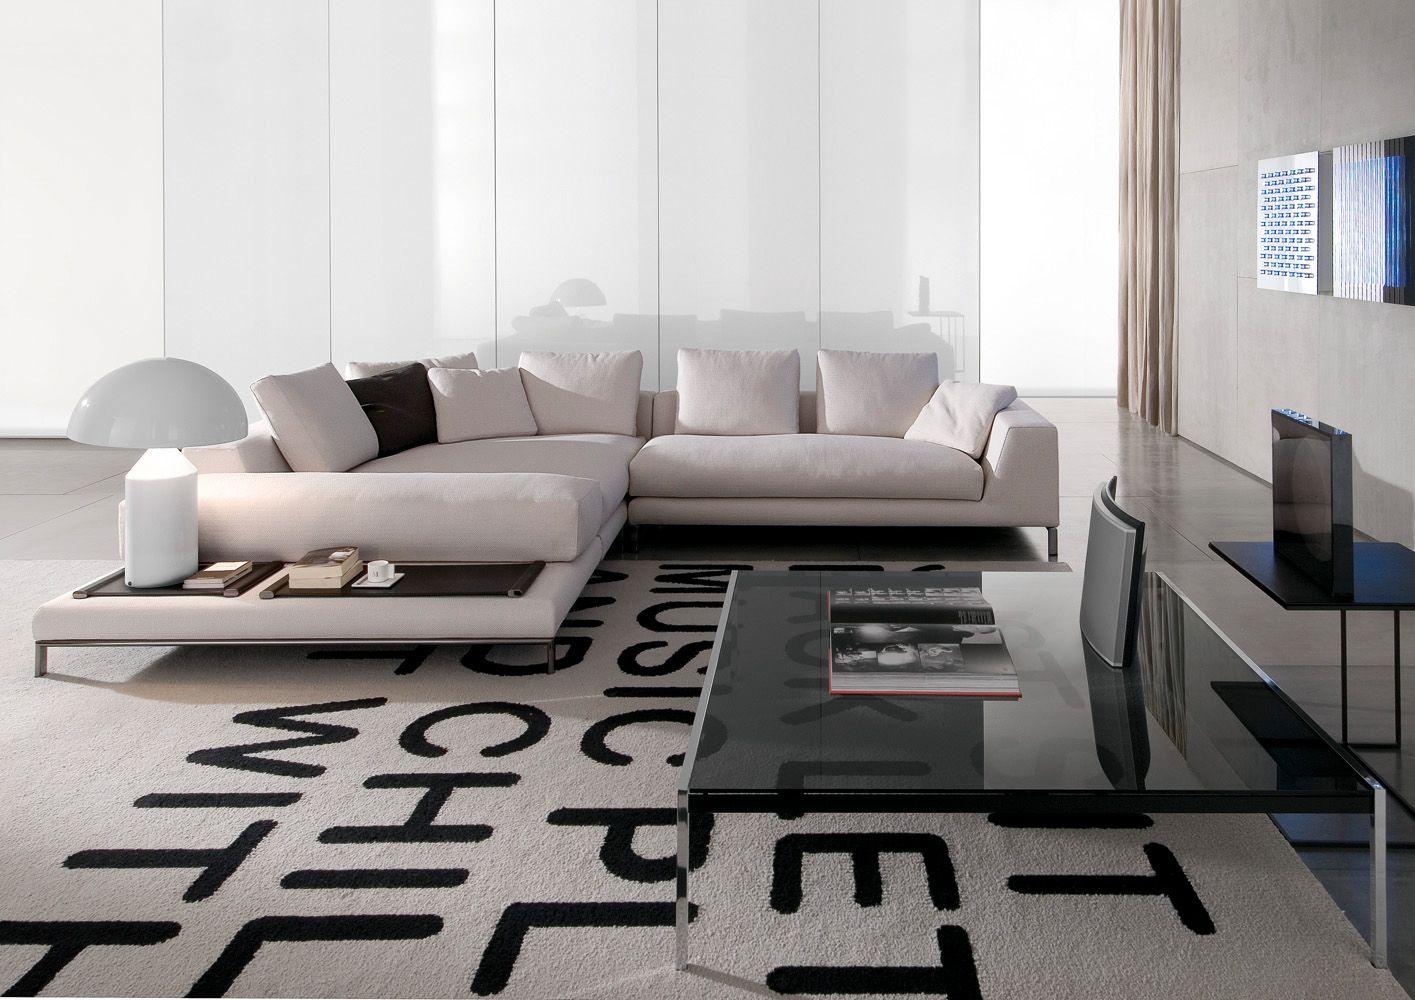 Minotti Ipad - HAMILTON ISLANDS - SOFAS DE   意大利奢侈家具品牌 ...